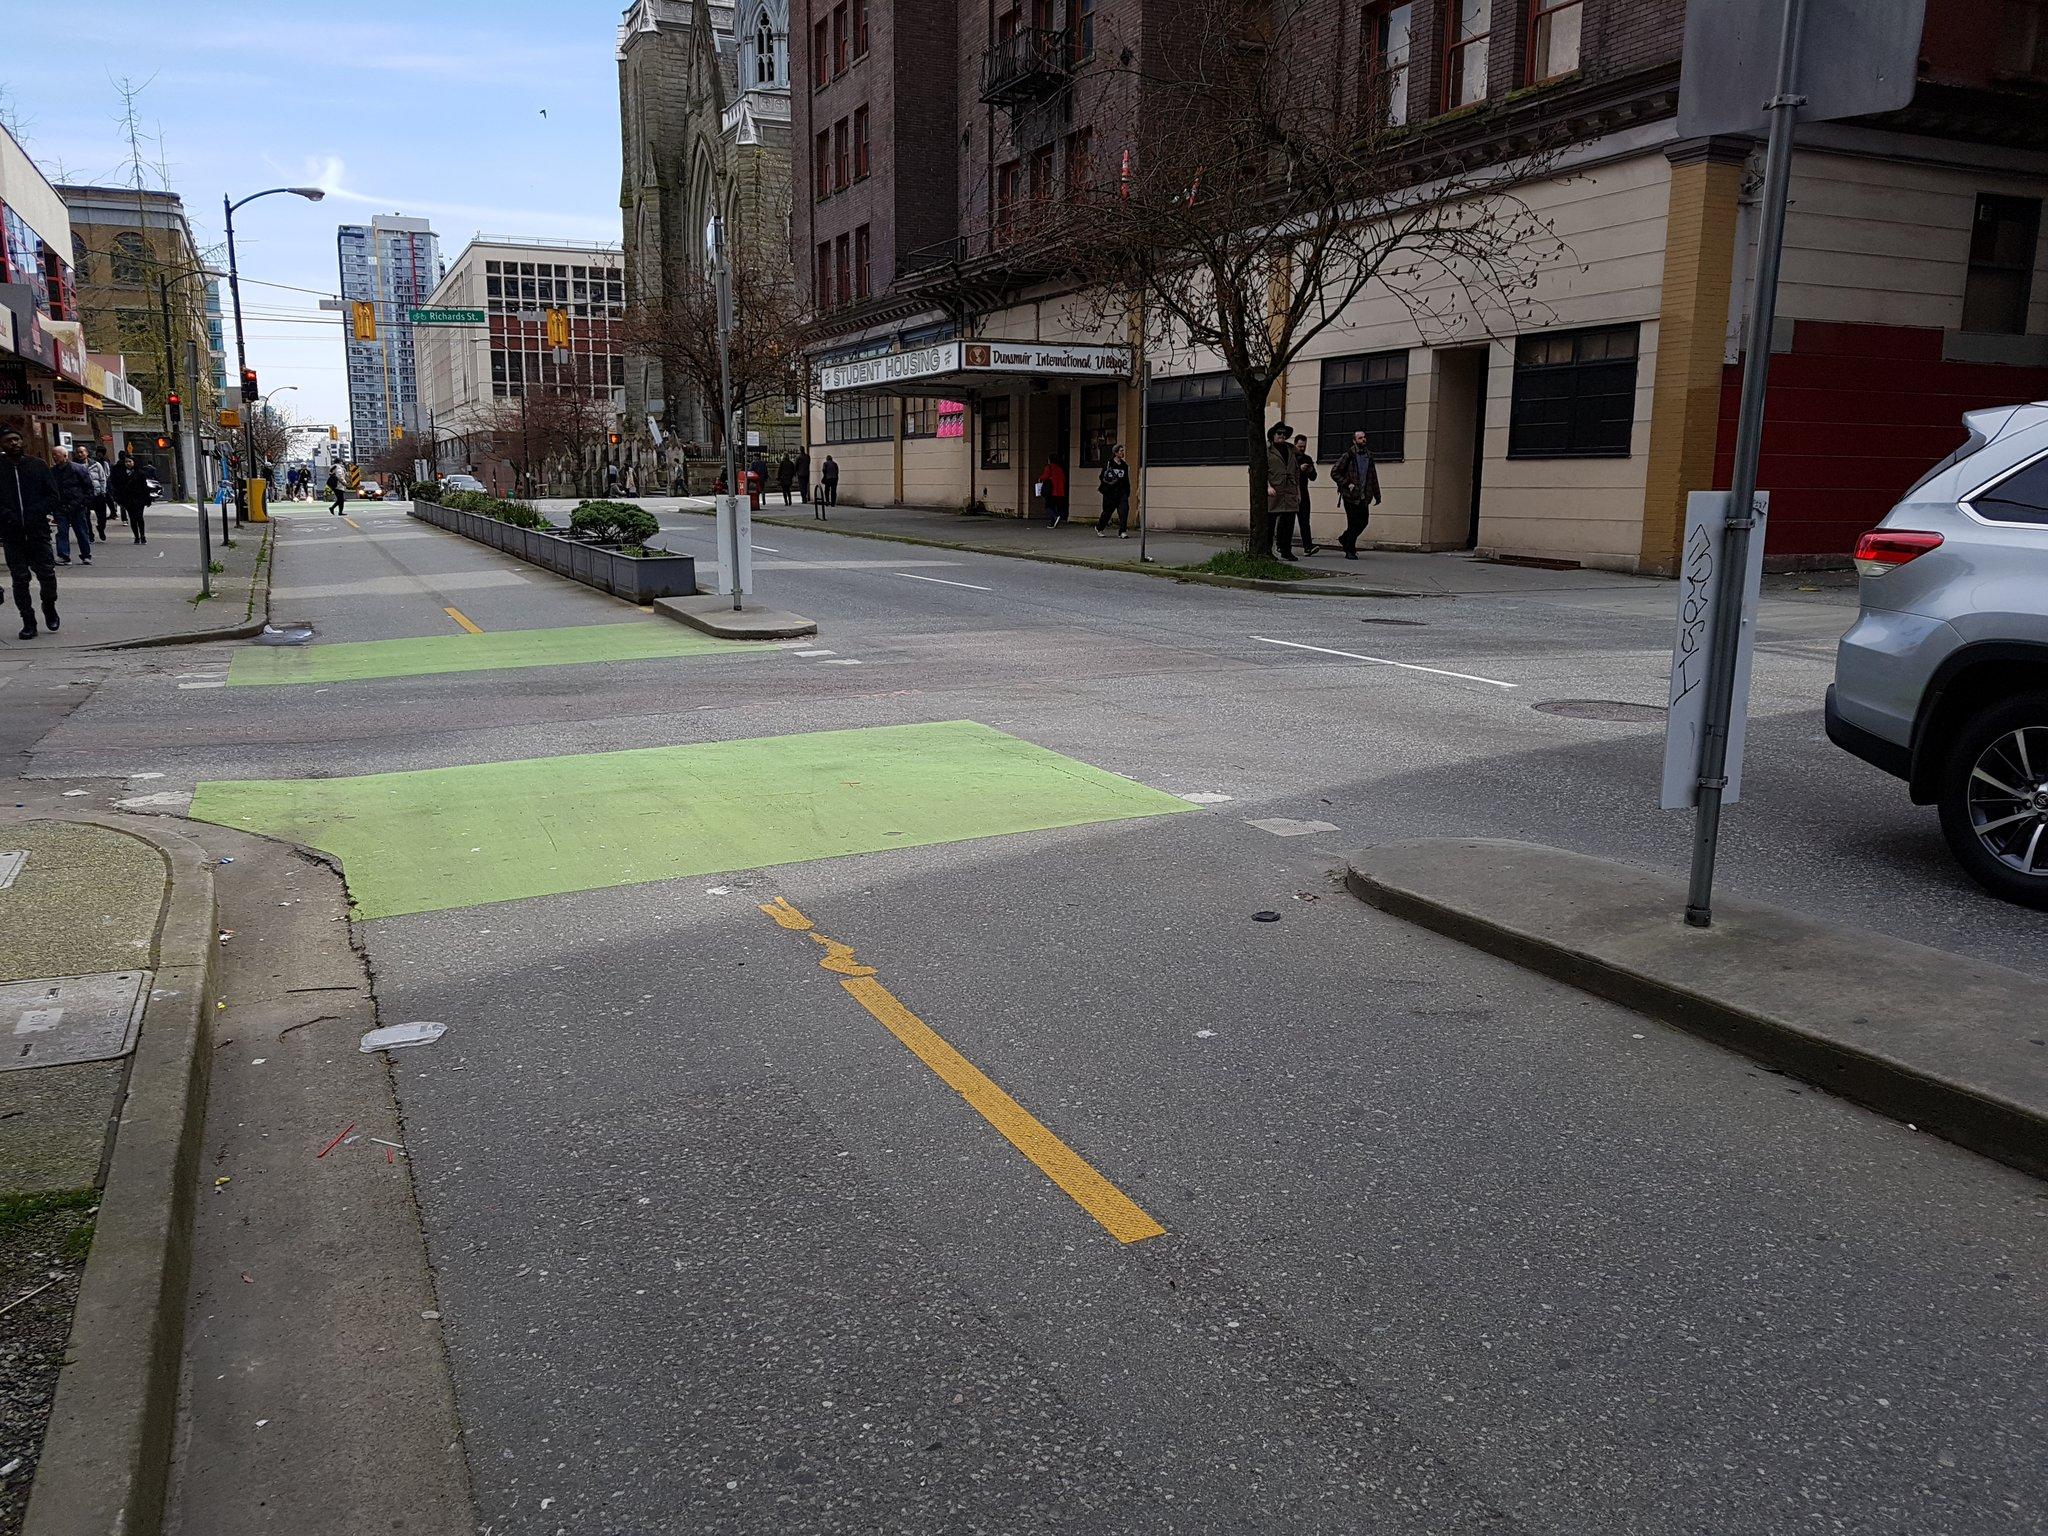 Note laneway crossing design. Concrete narrows entrance to slow vehicle drivers down. Contrast w Pandora w overly wide driveways #yyjbike https://t.co/idR0GcqJ0R